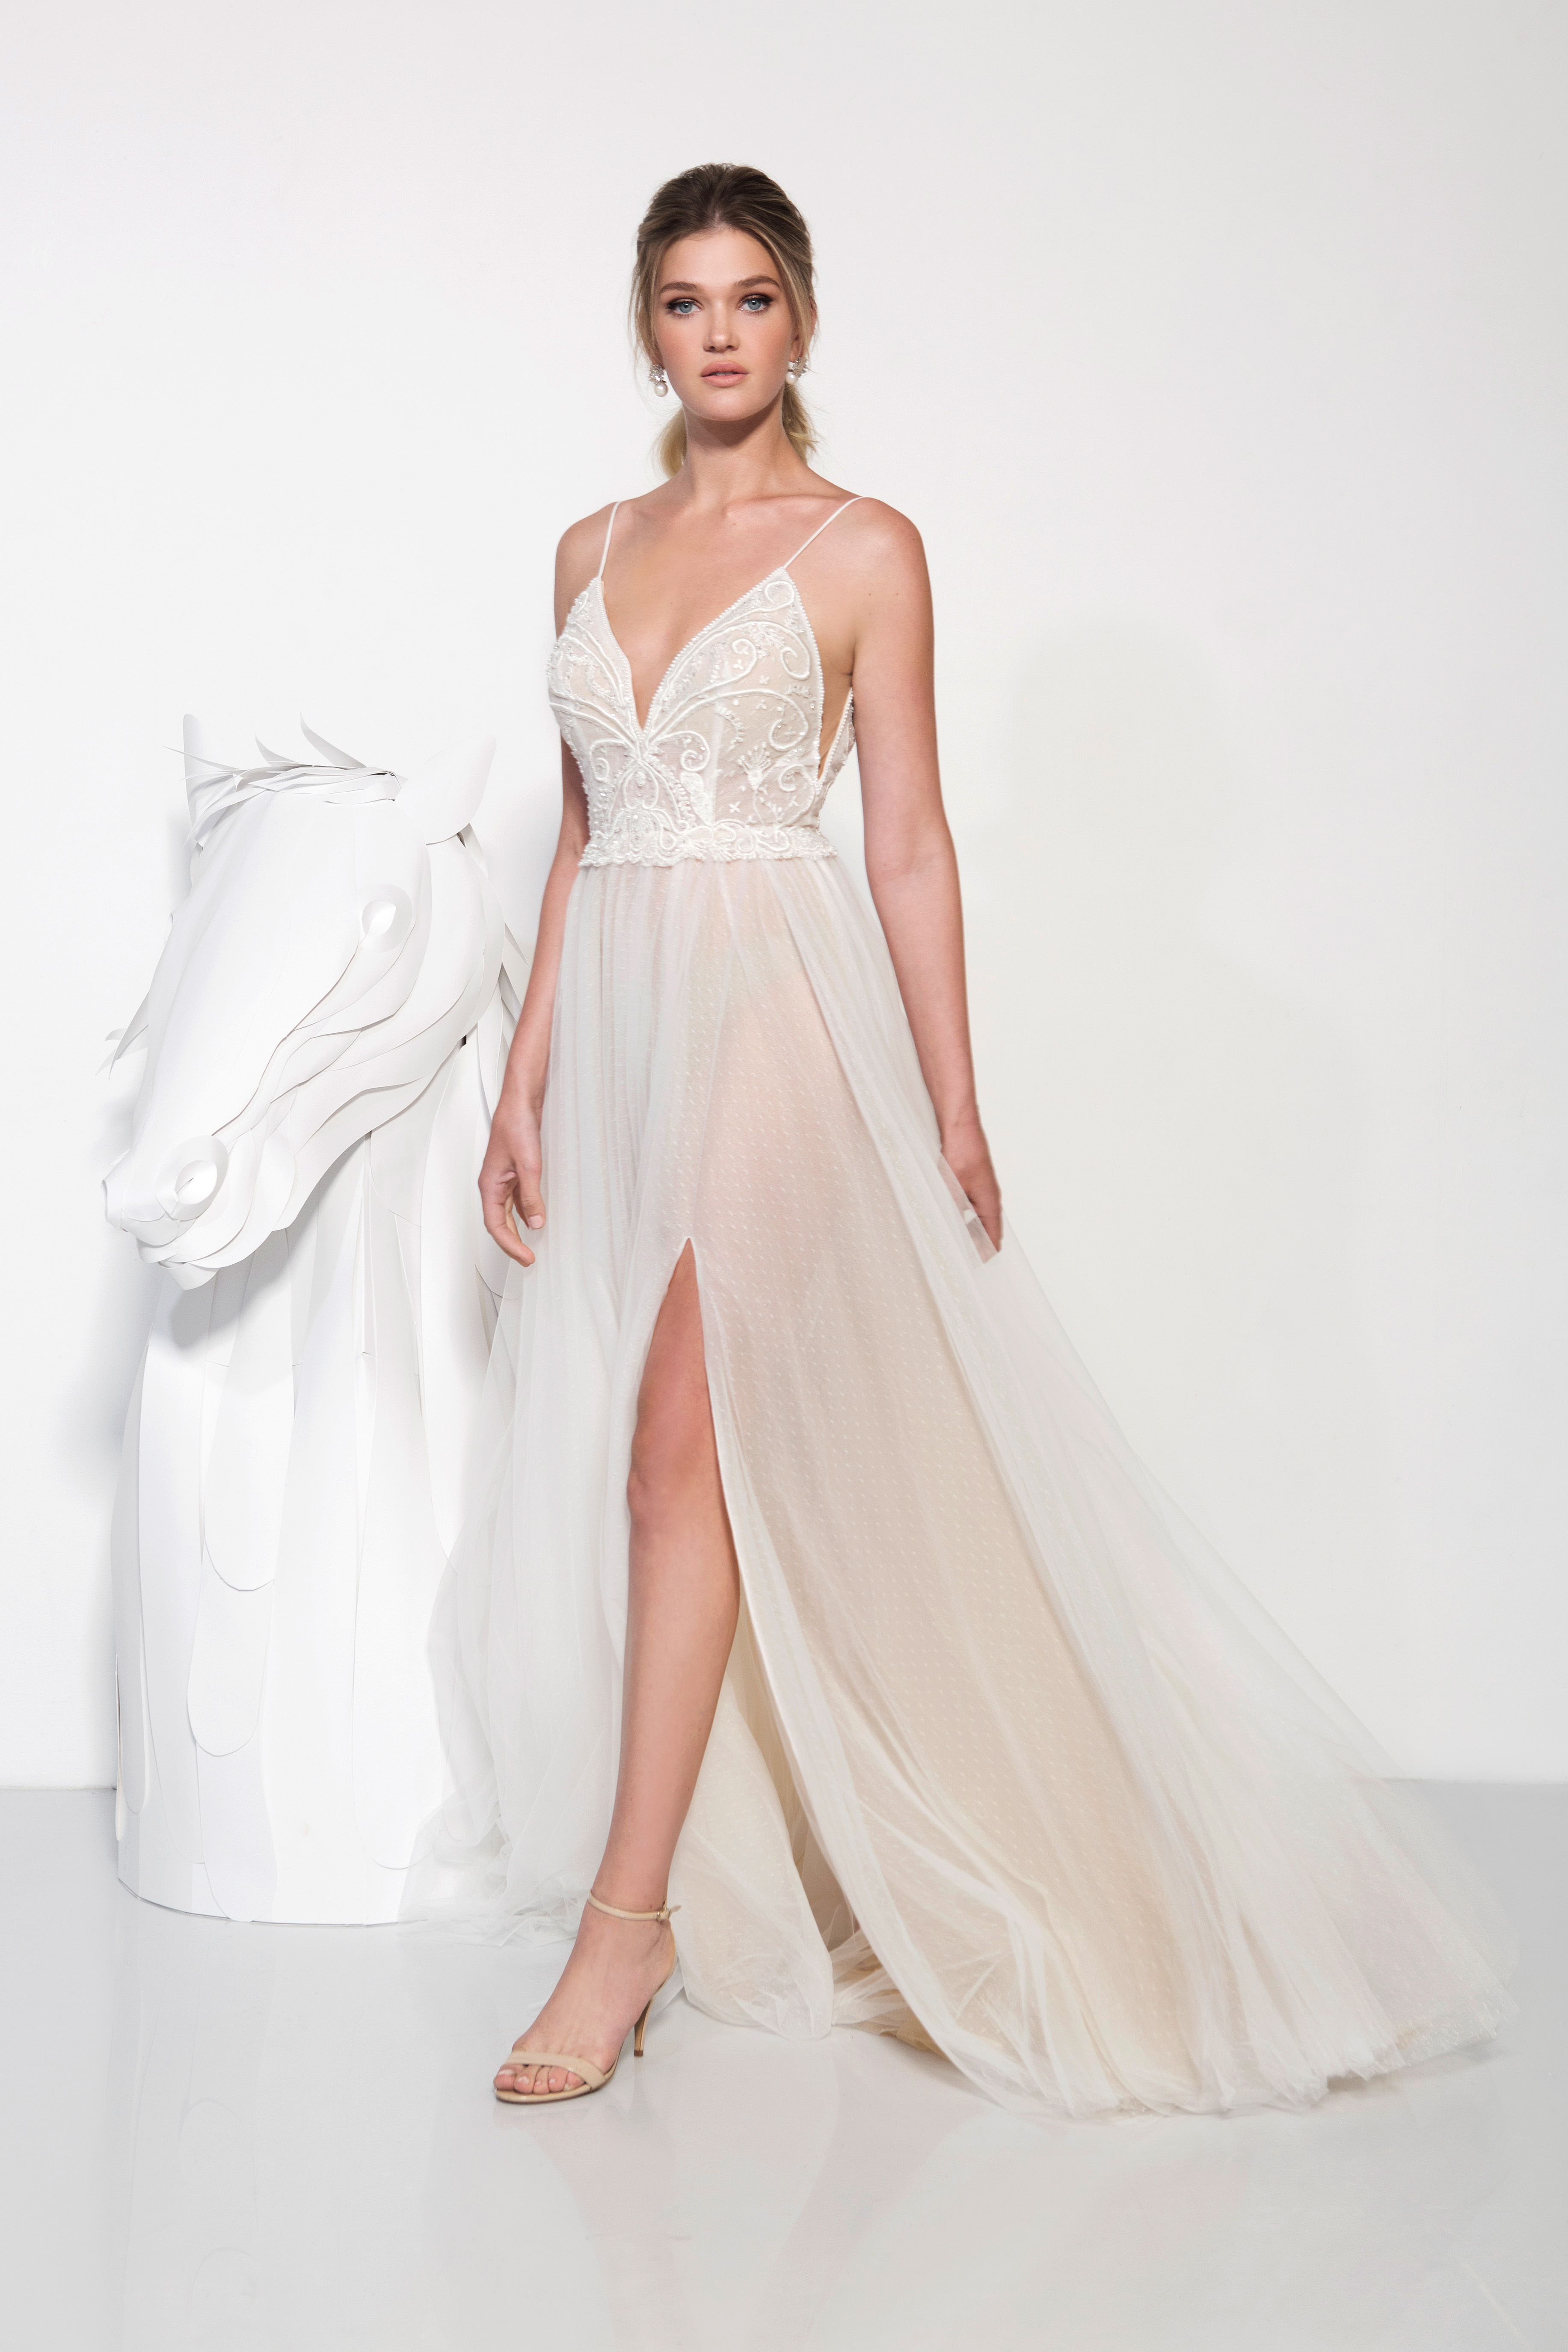 lavish by yaniv persy wedding dress spring 2019 spaghetti straps a-line deep v